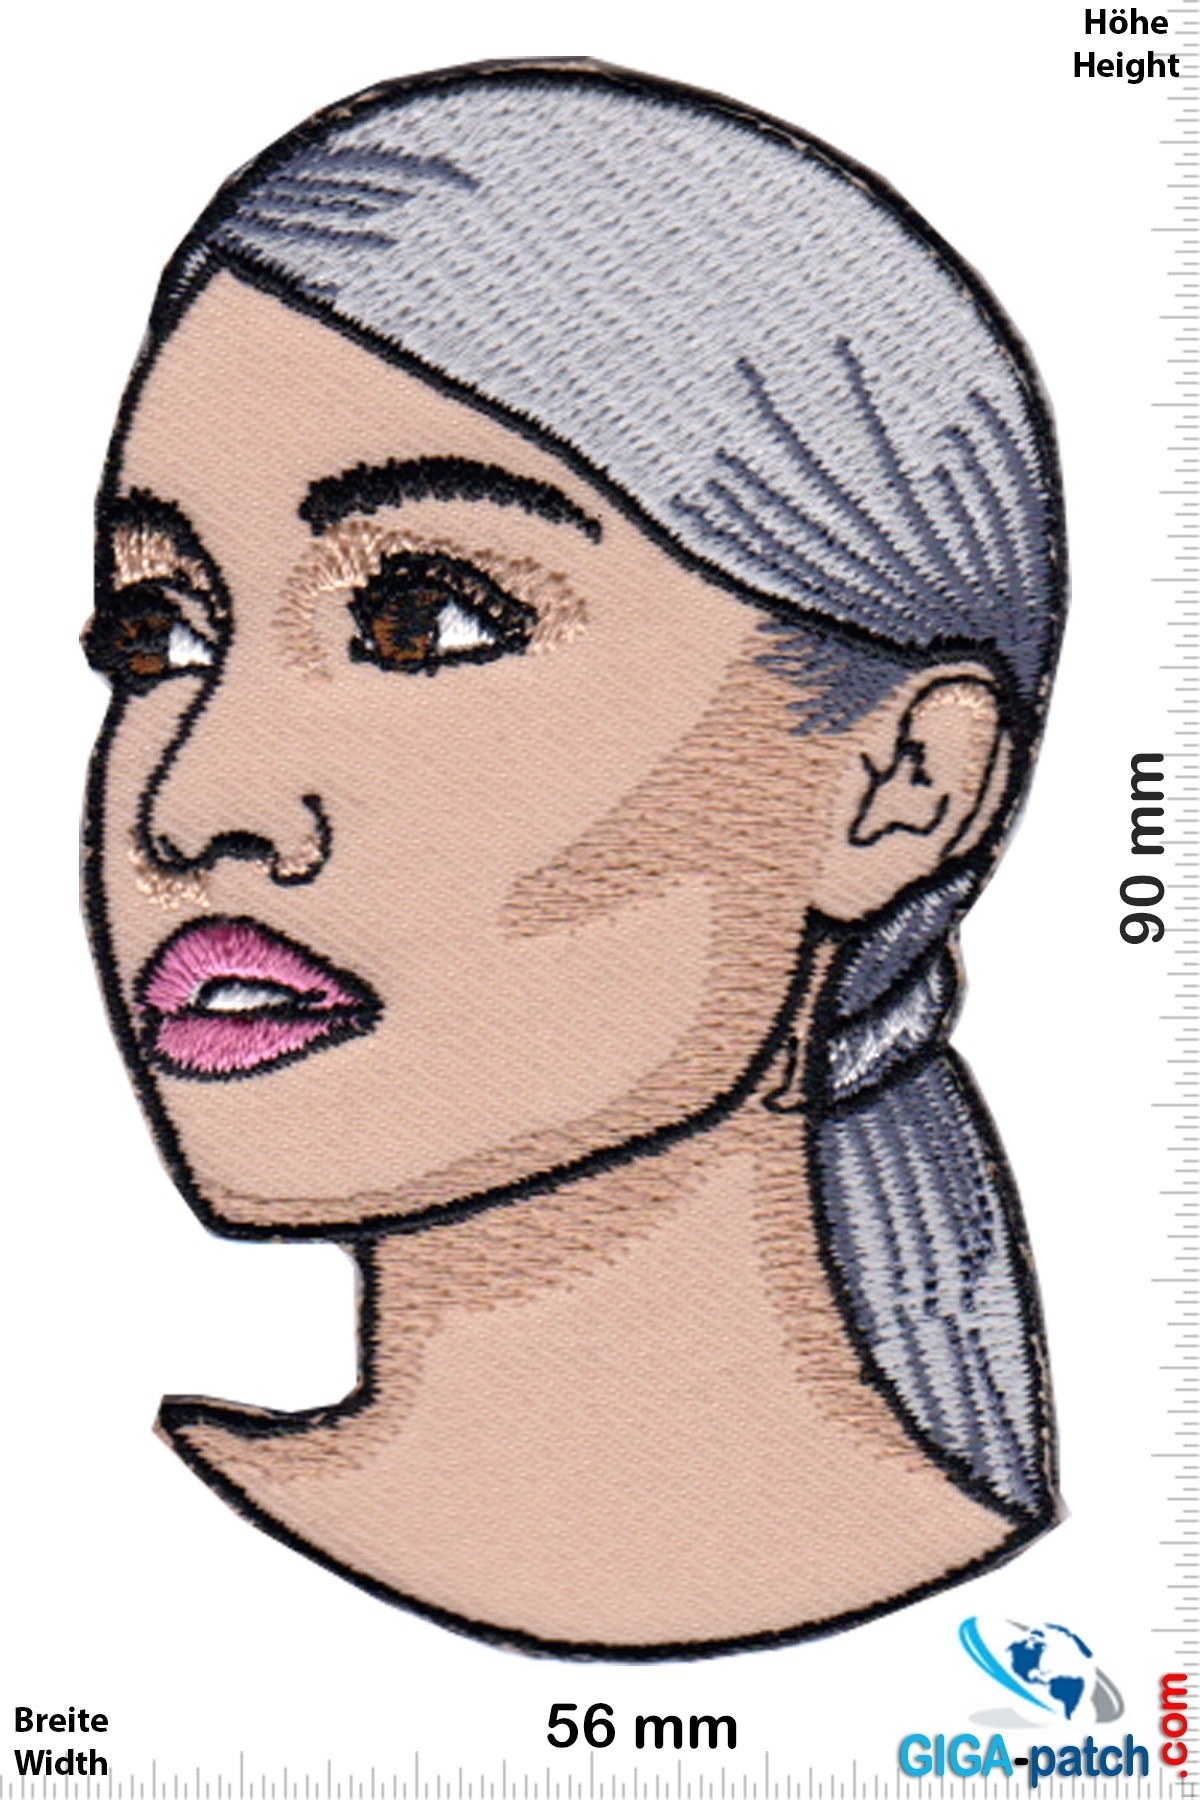 Ariana Grande-Butera - Head